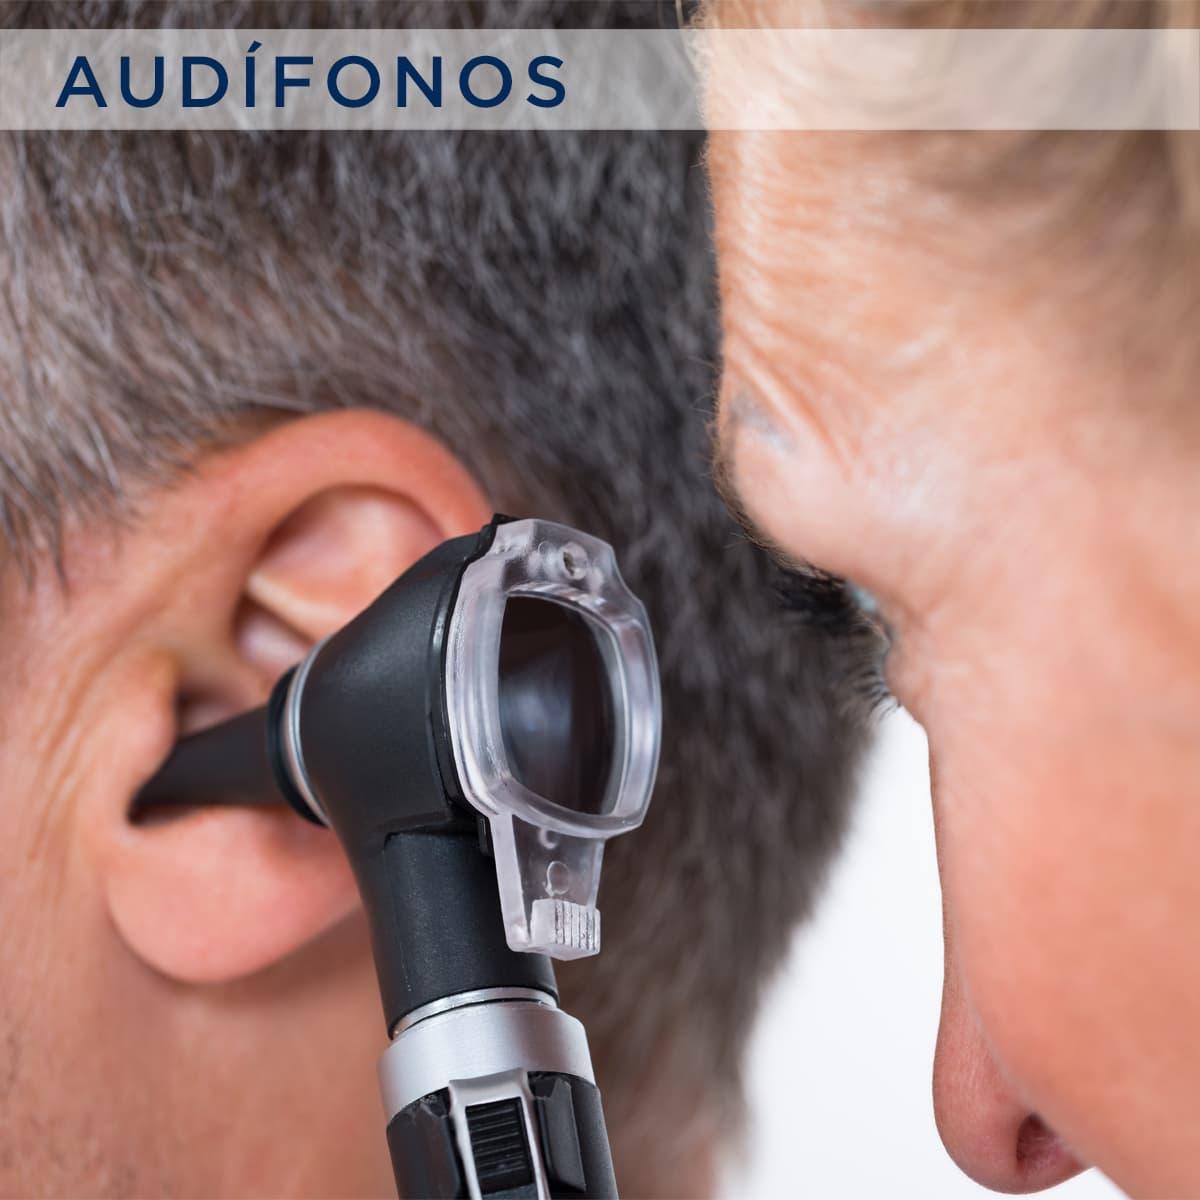 productos audifonos optica muralla